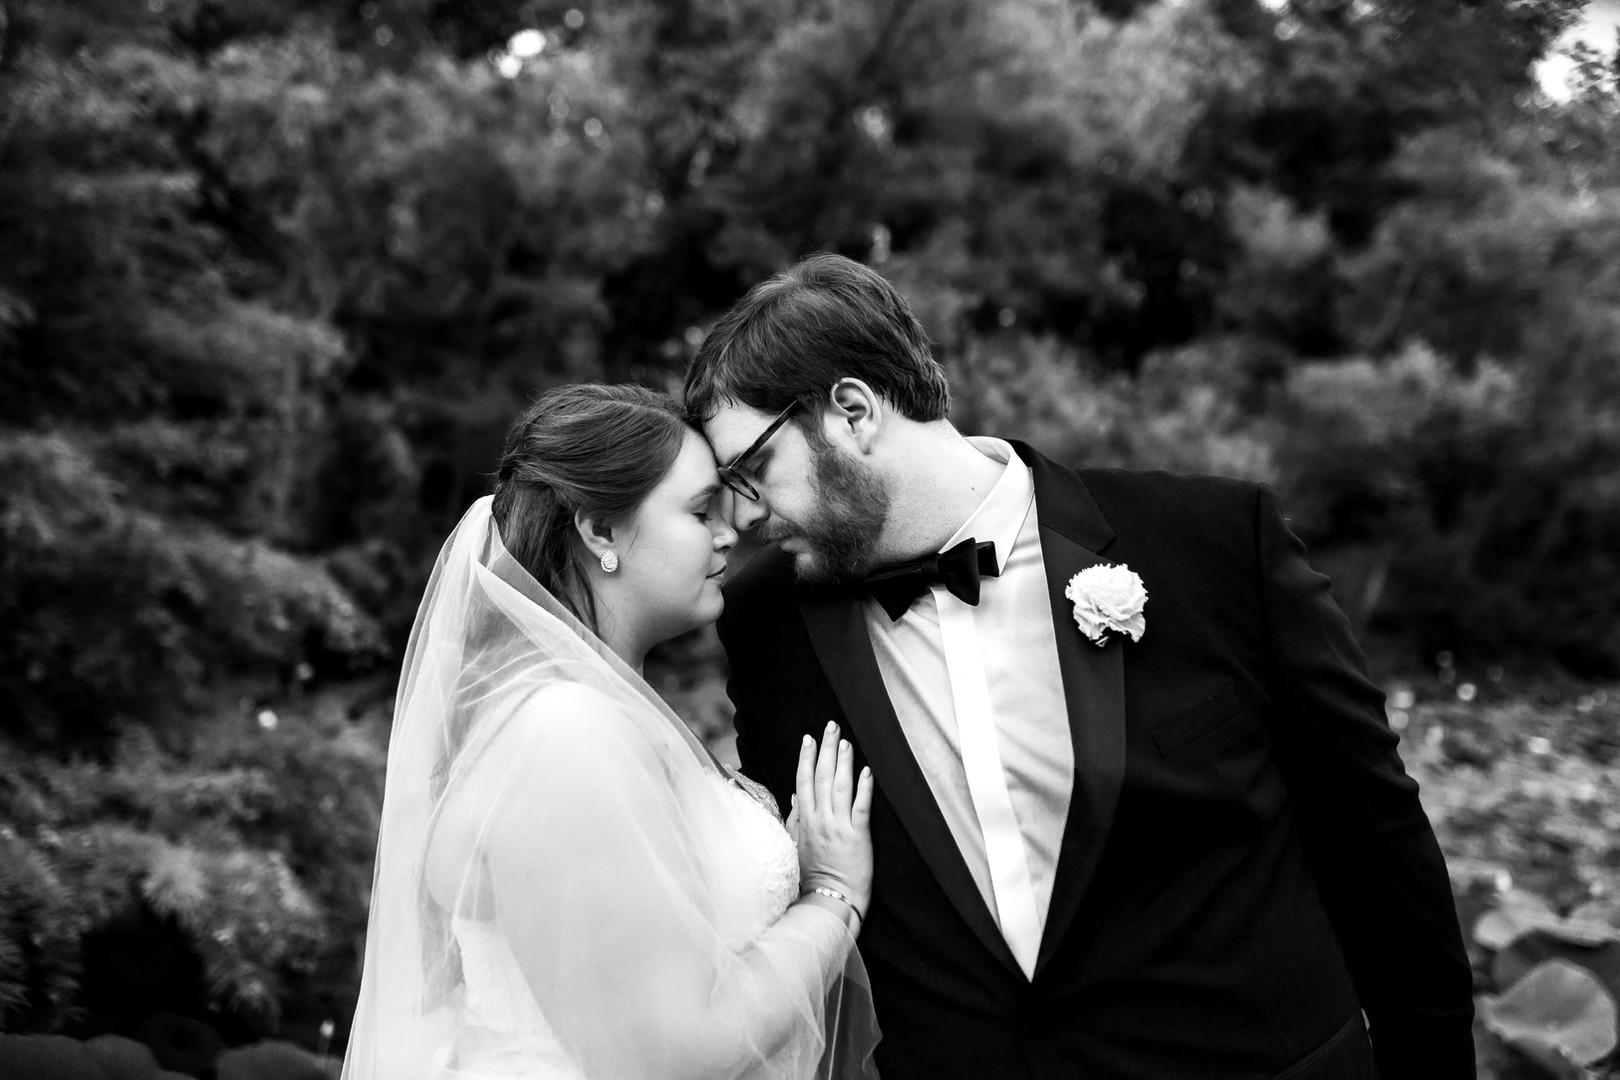 Memphis Wedding Photographers, Michelle Evans Art, Wedding Dress Memphis,  Michelle Evans Photography, Memphis Weddings, Greenhouse Weddings, Bohemian Weddings, Bohemian Bride, Literman Nature Center Weddings